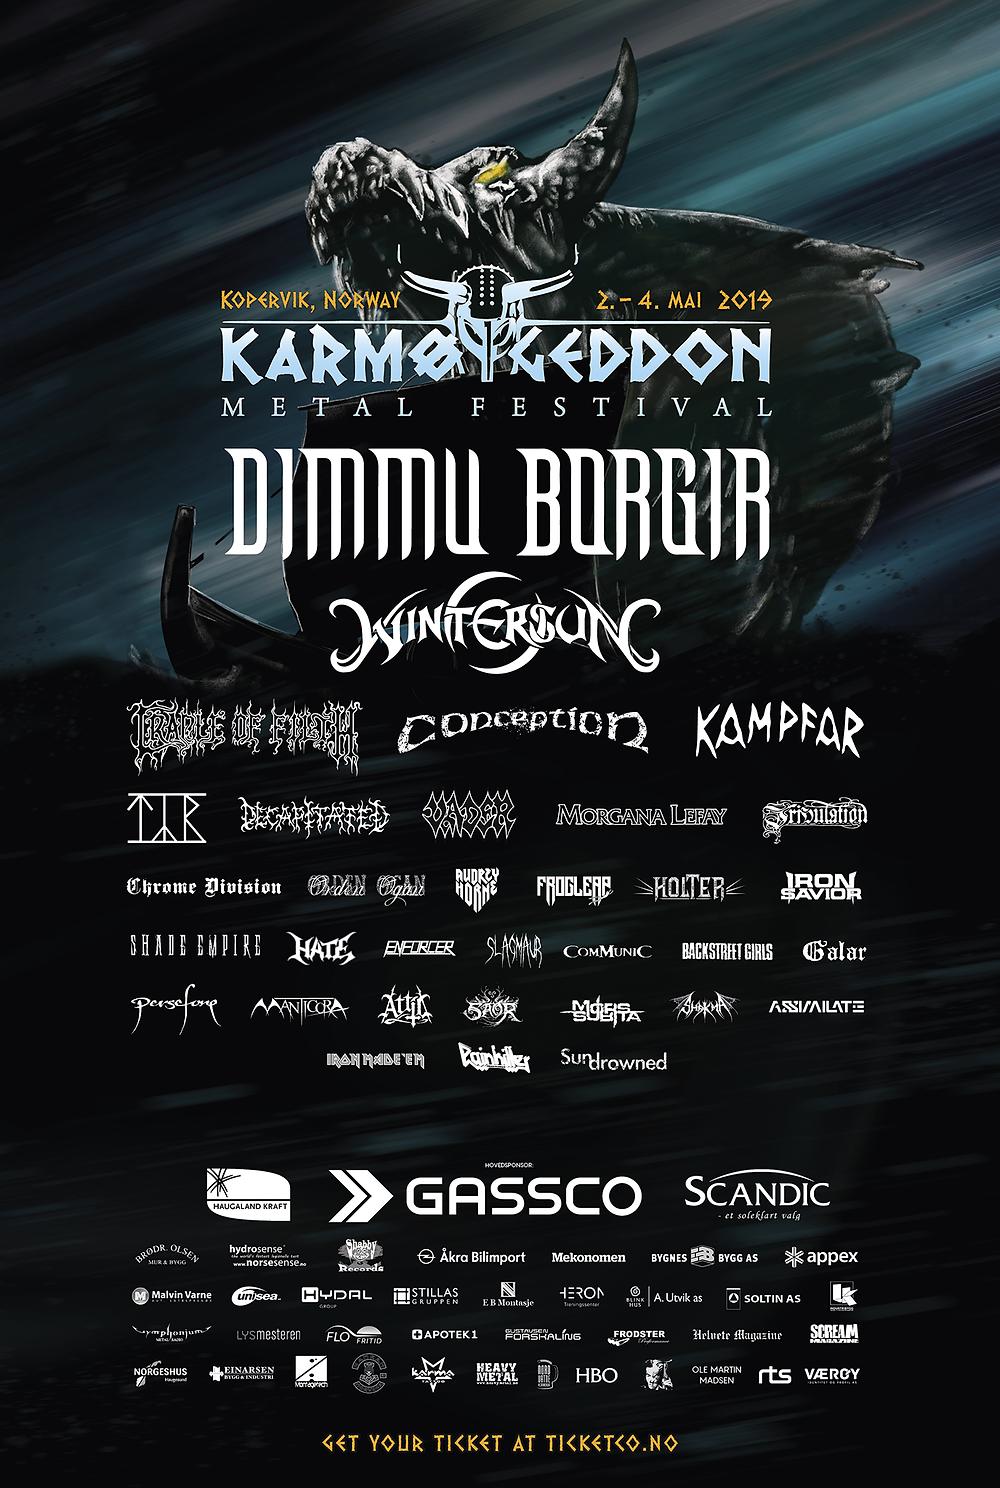 The 2019 Karmøygeddon Festival Poster